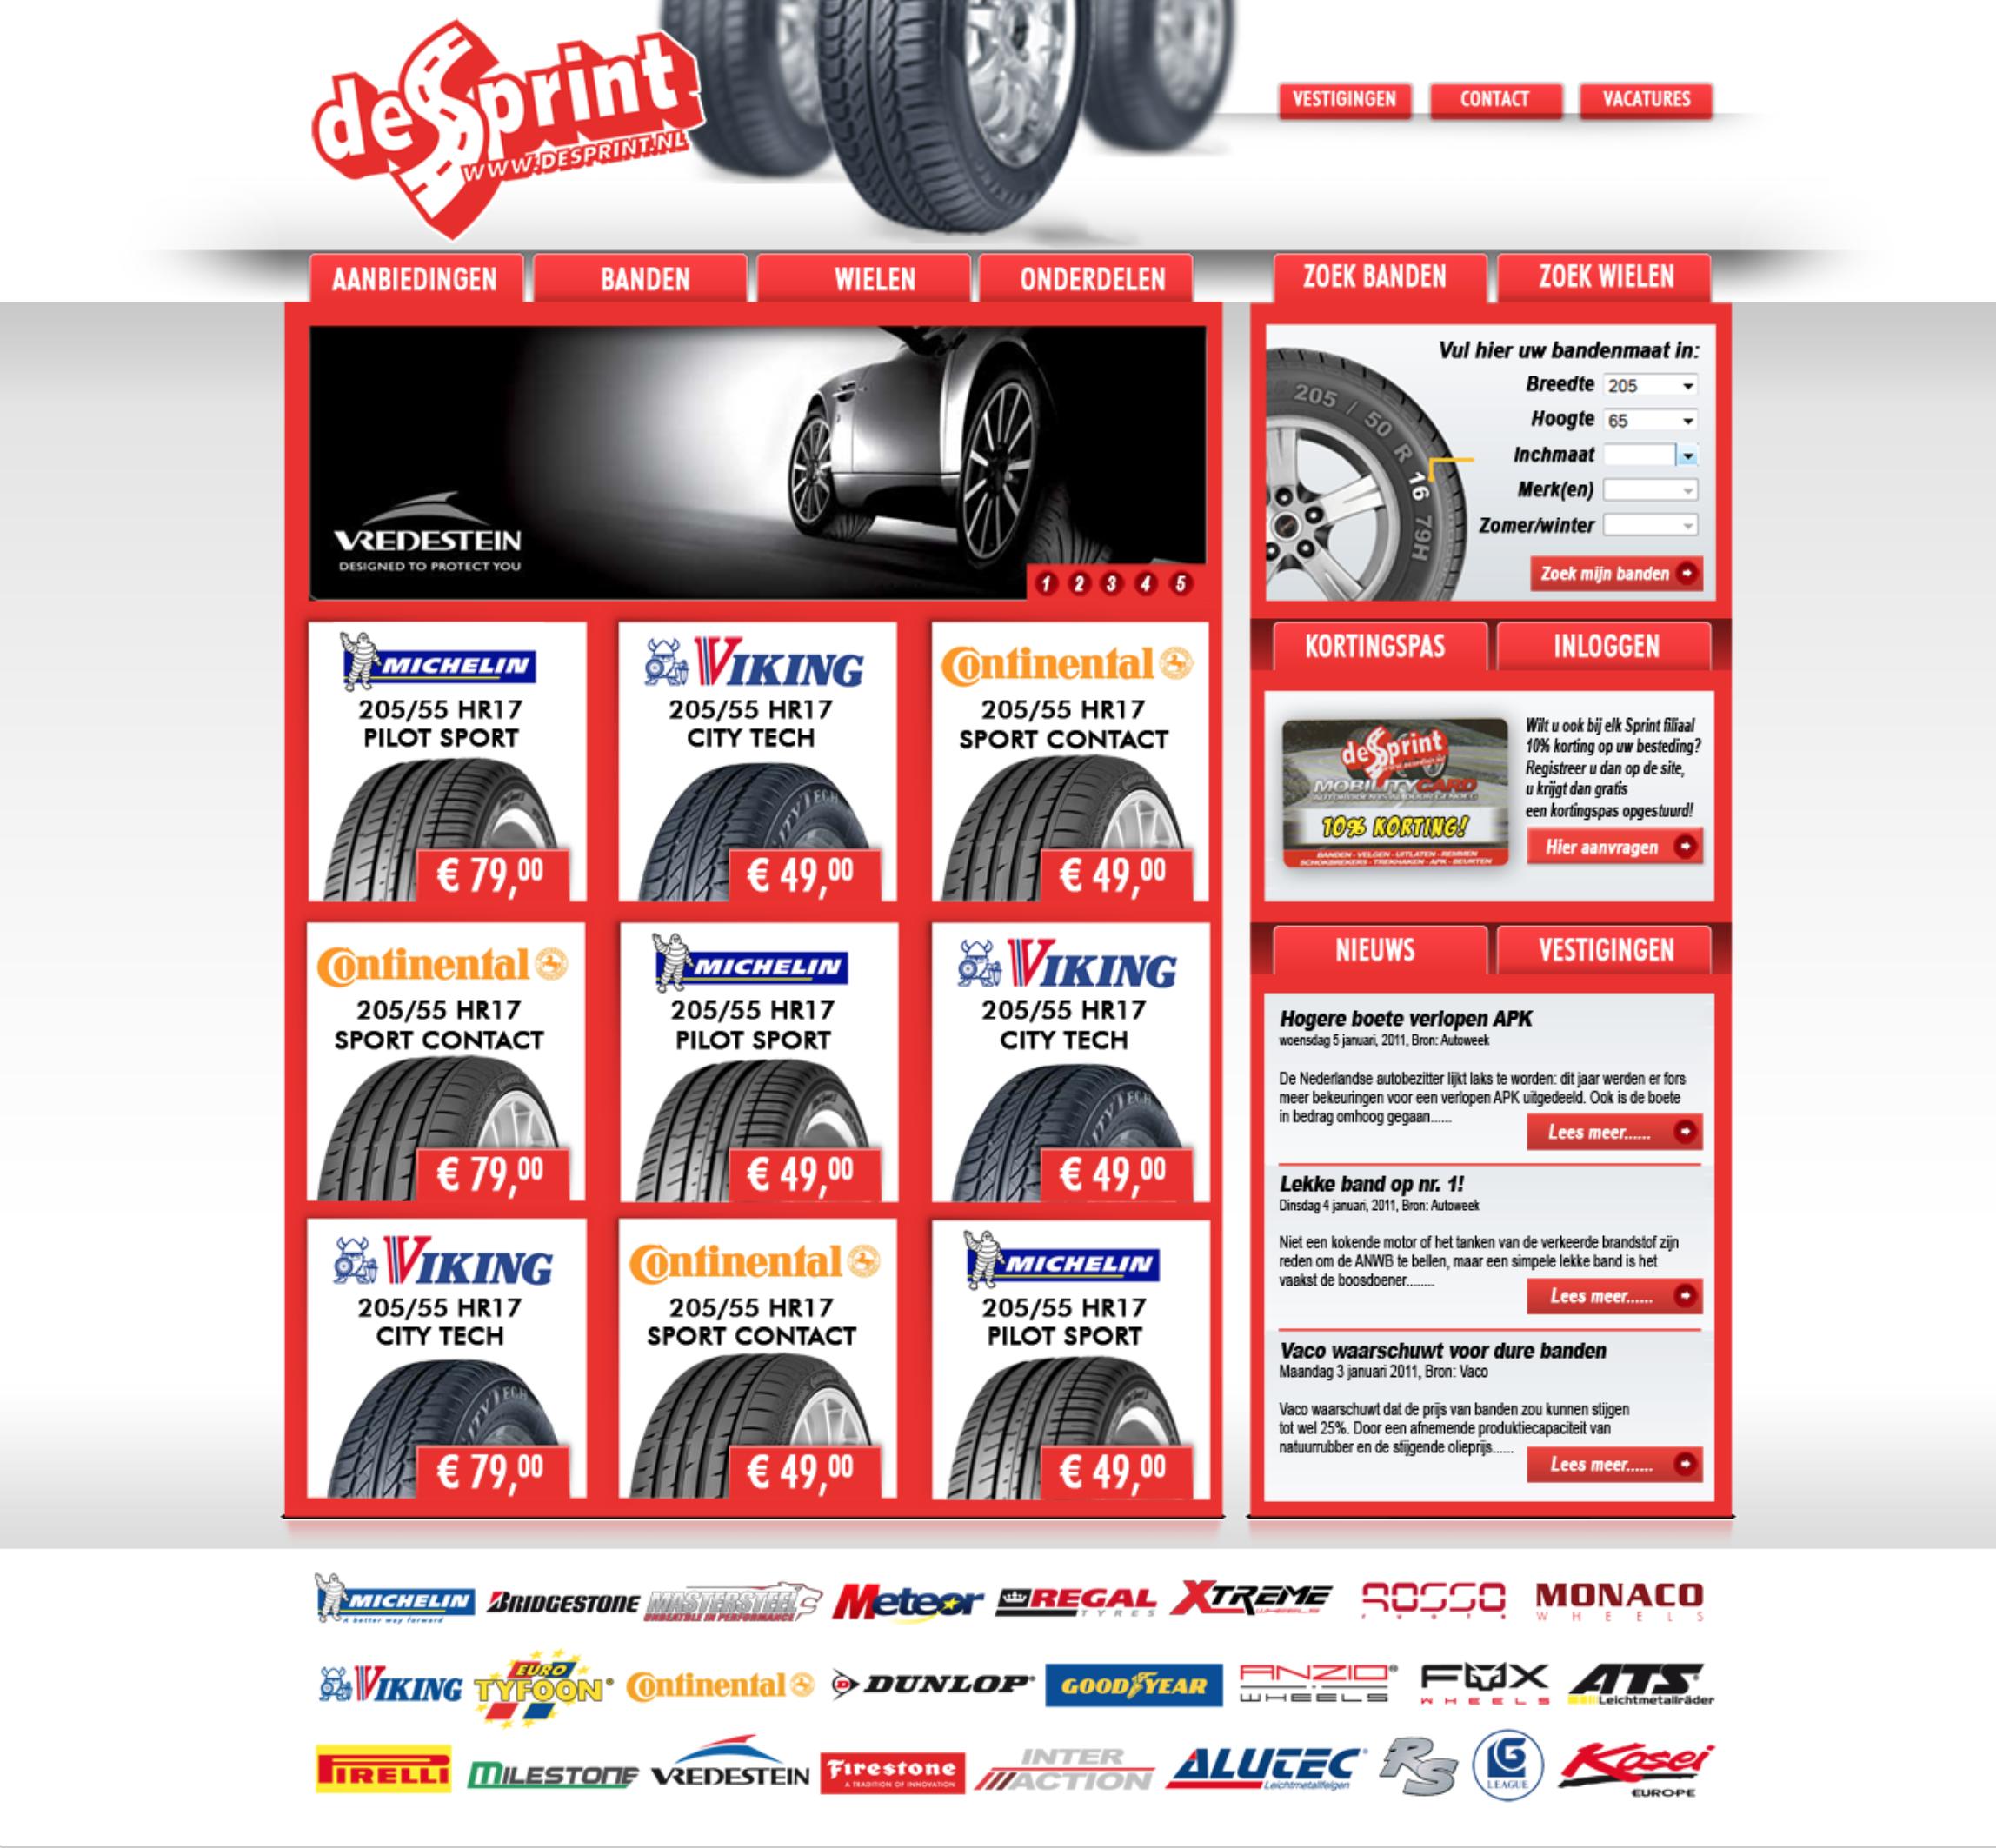 De Sprint website design